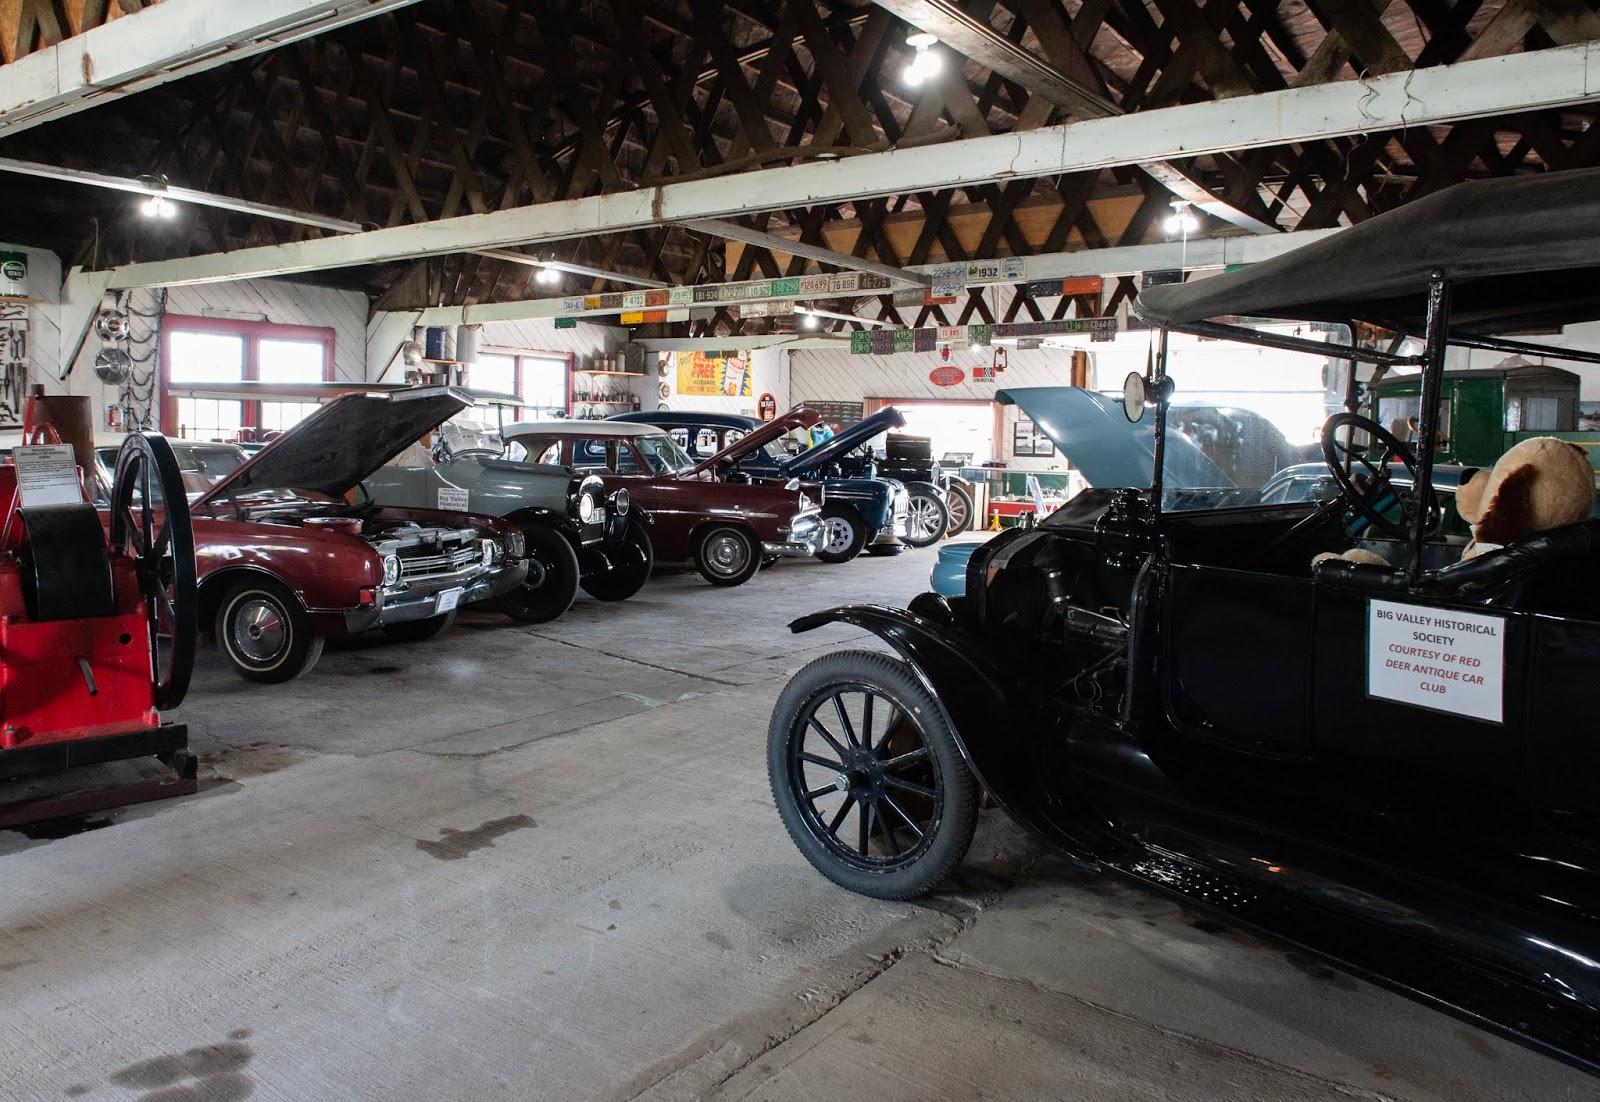 McLaren Motors Garage, Stettler, Alberta